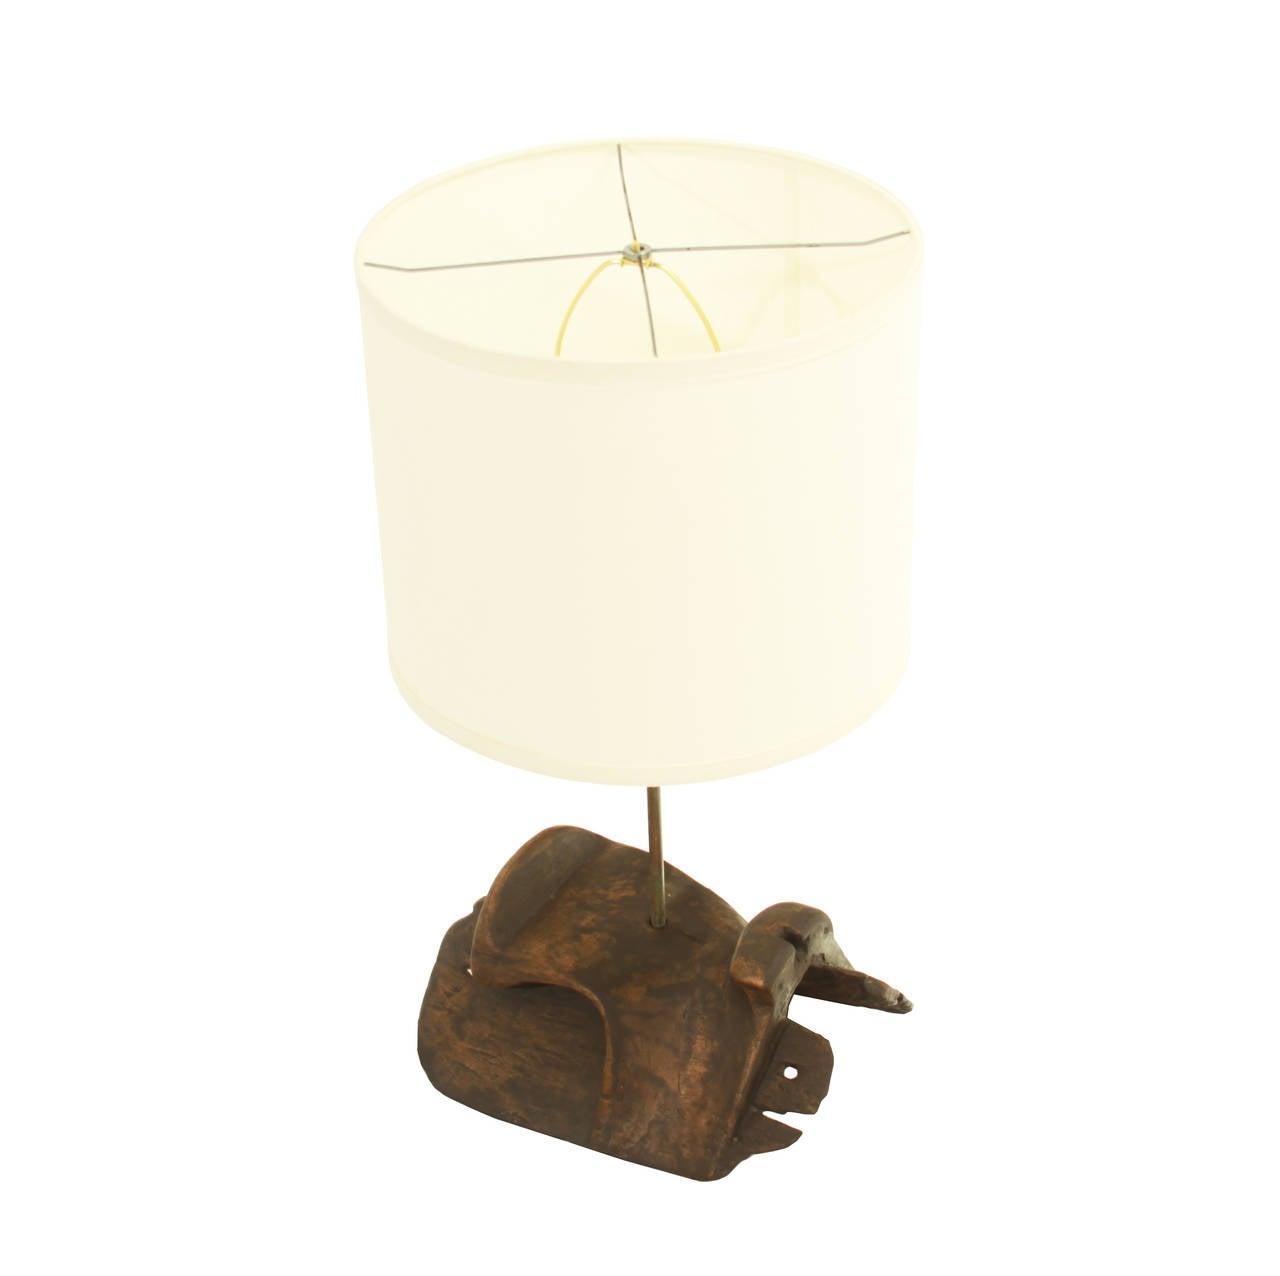 carved wood and brass saddle tree table desk lamps for sale at 1stdibs. Black Bedroom Furniture Sets. Home Design Ideas